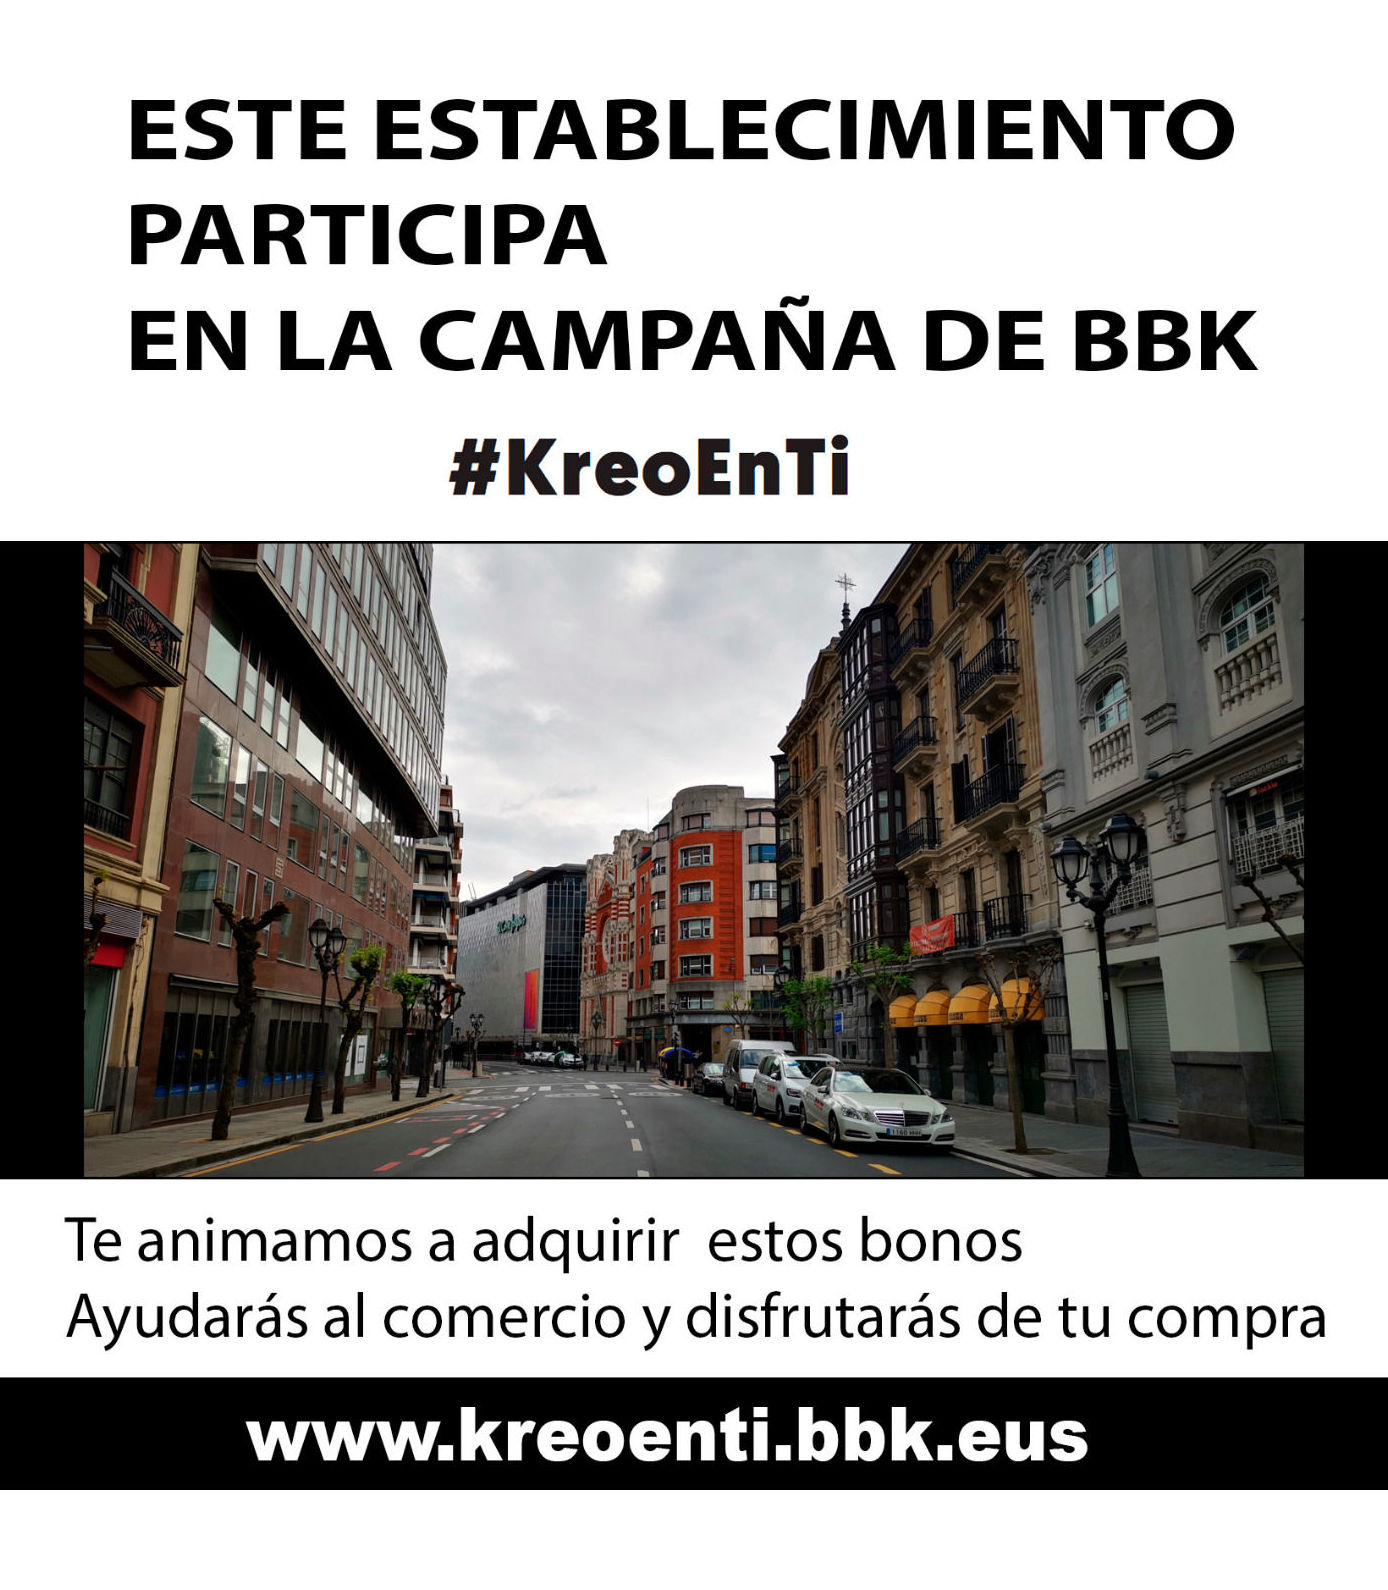 Bonos Kreoenti en Bilbao